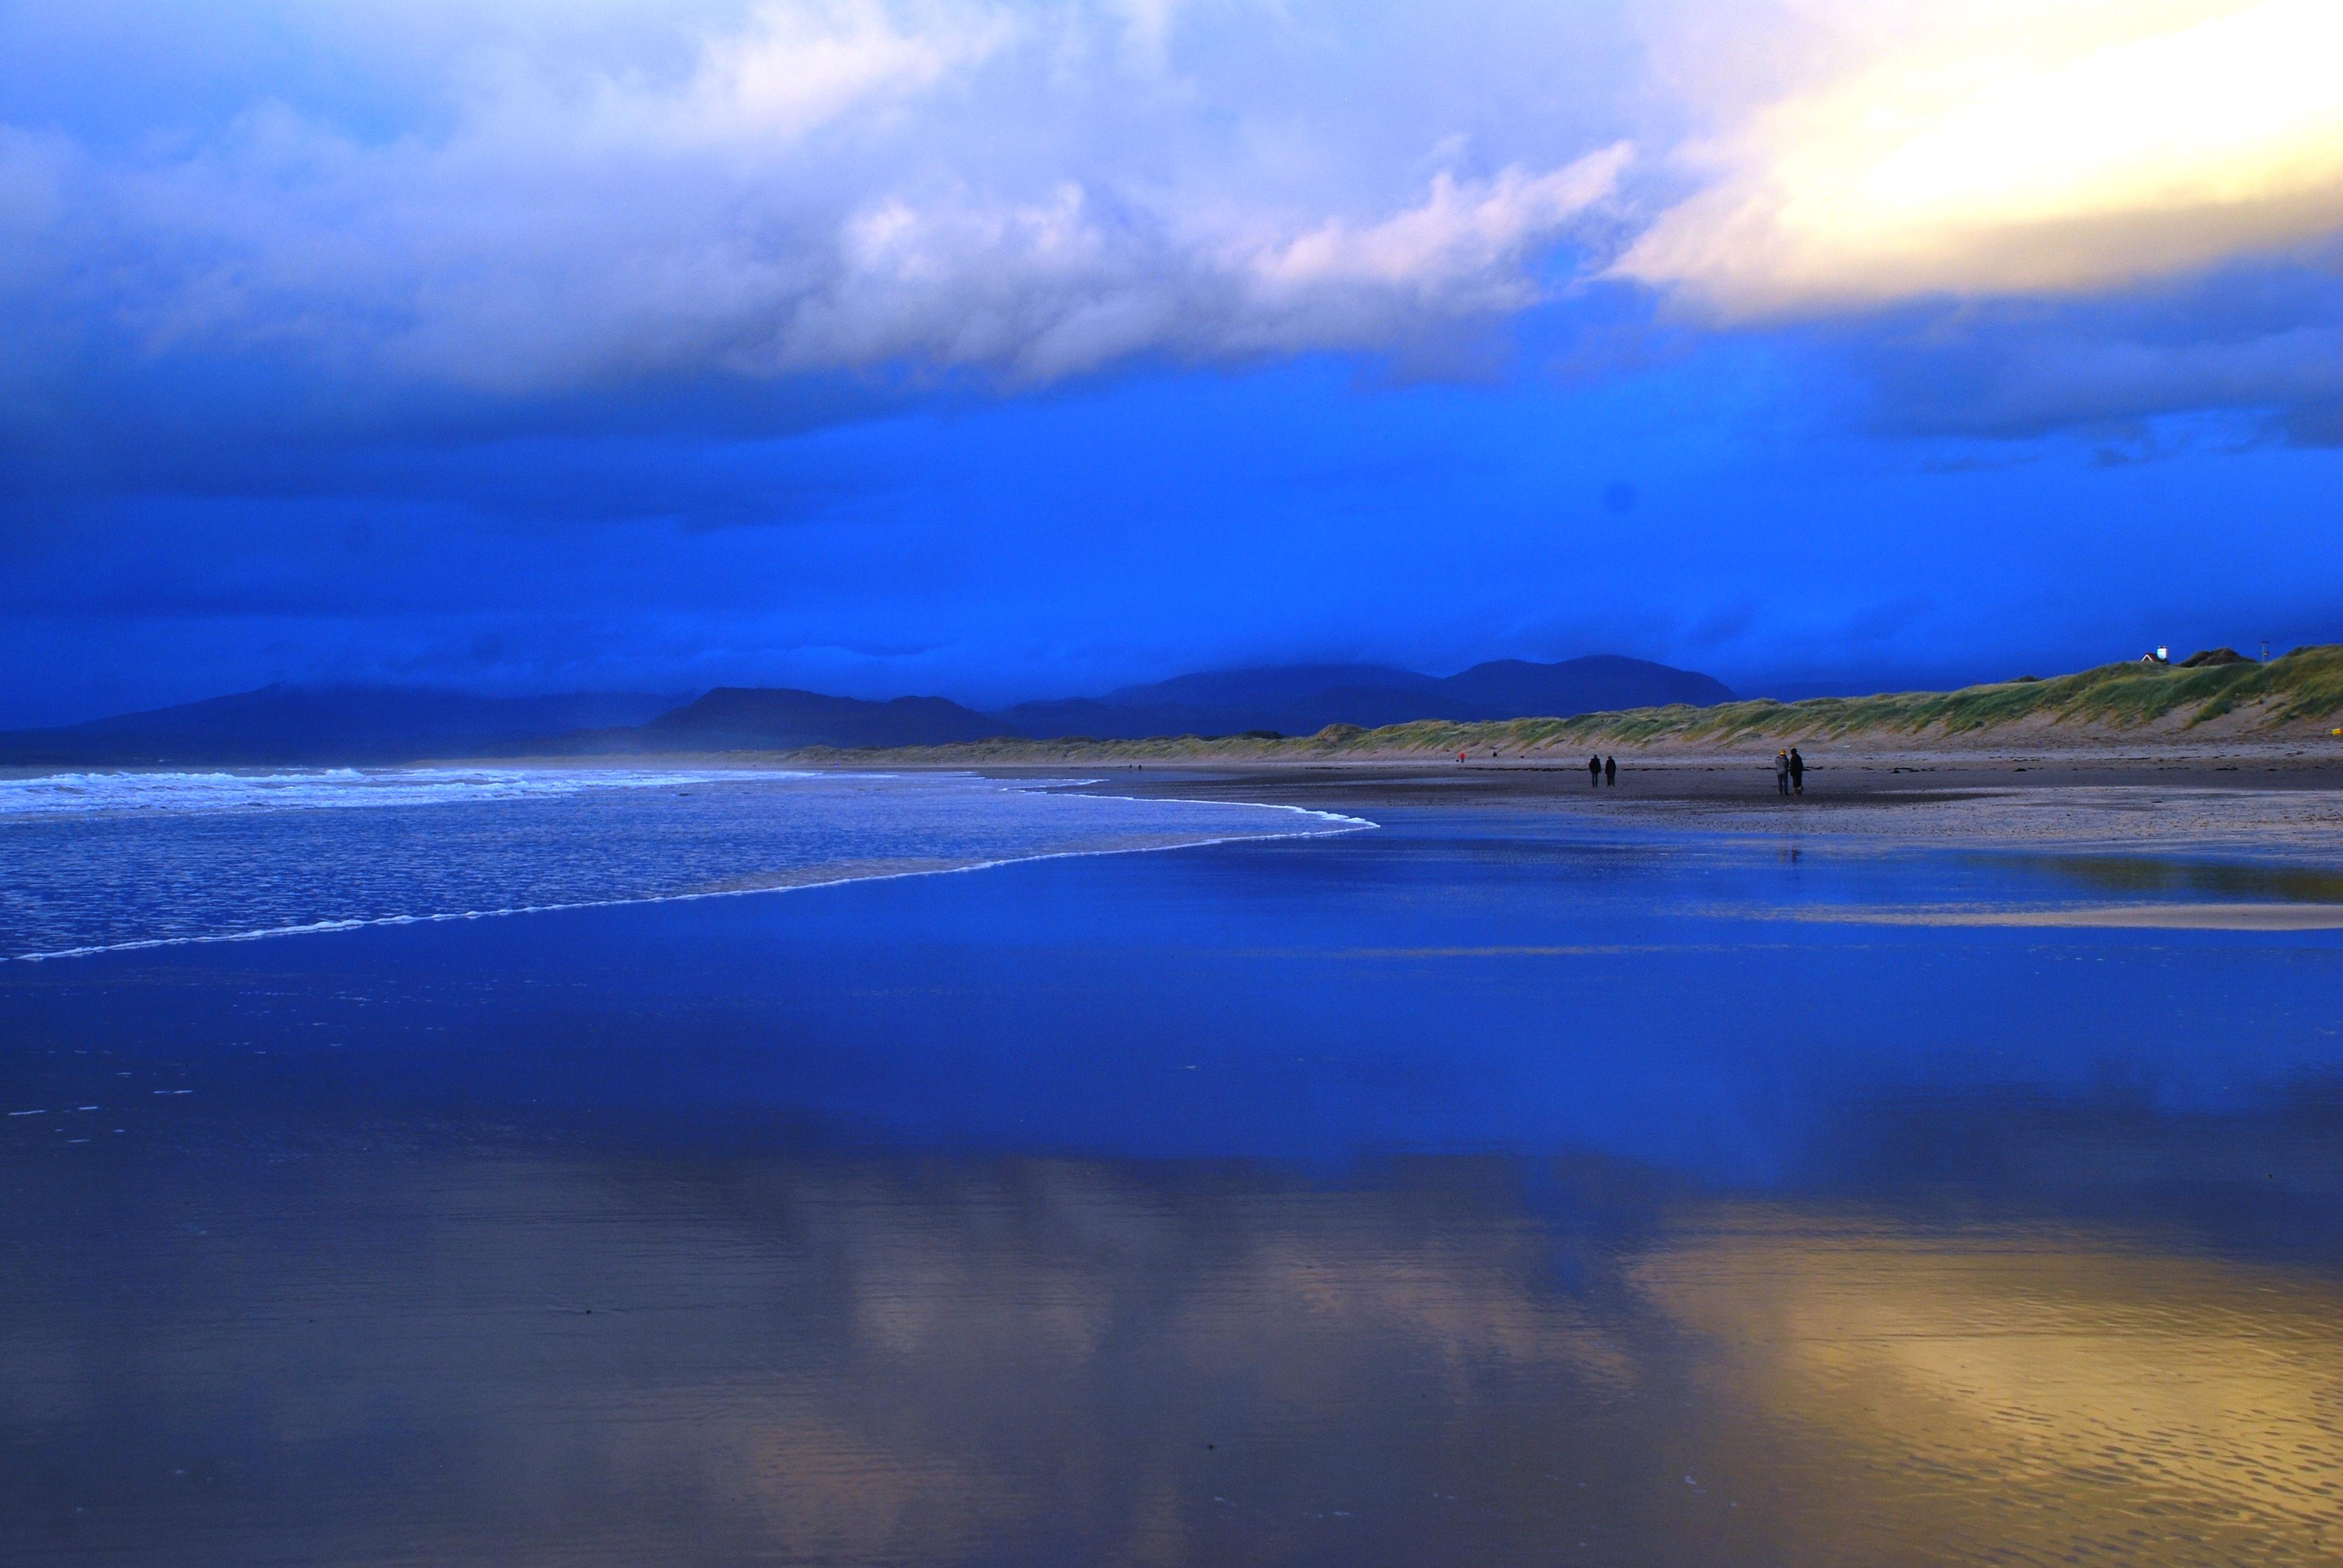 Harlech Beach Sunset Photo: Will Brownlie